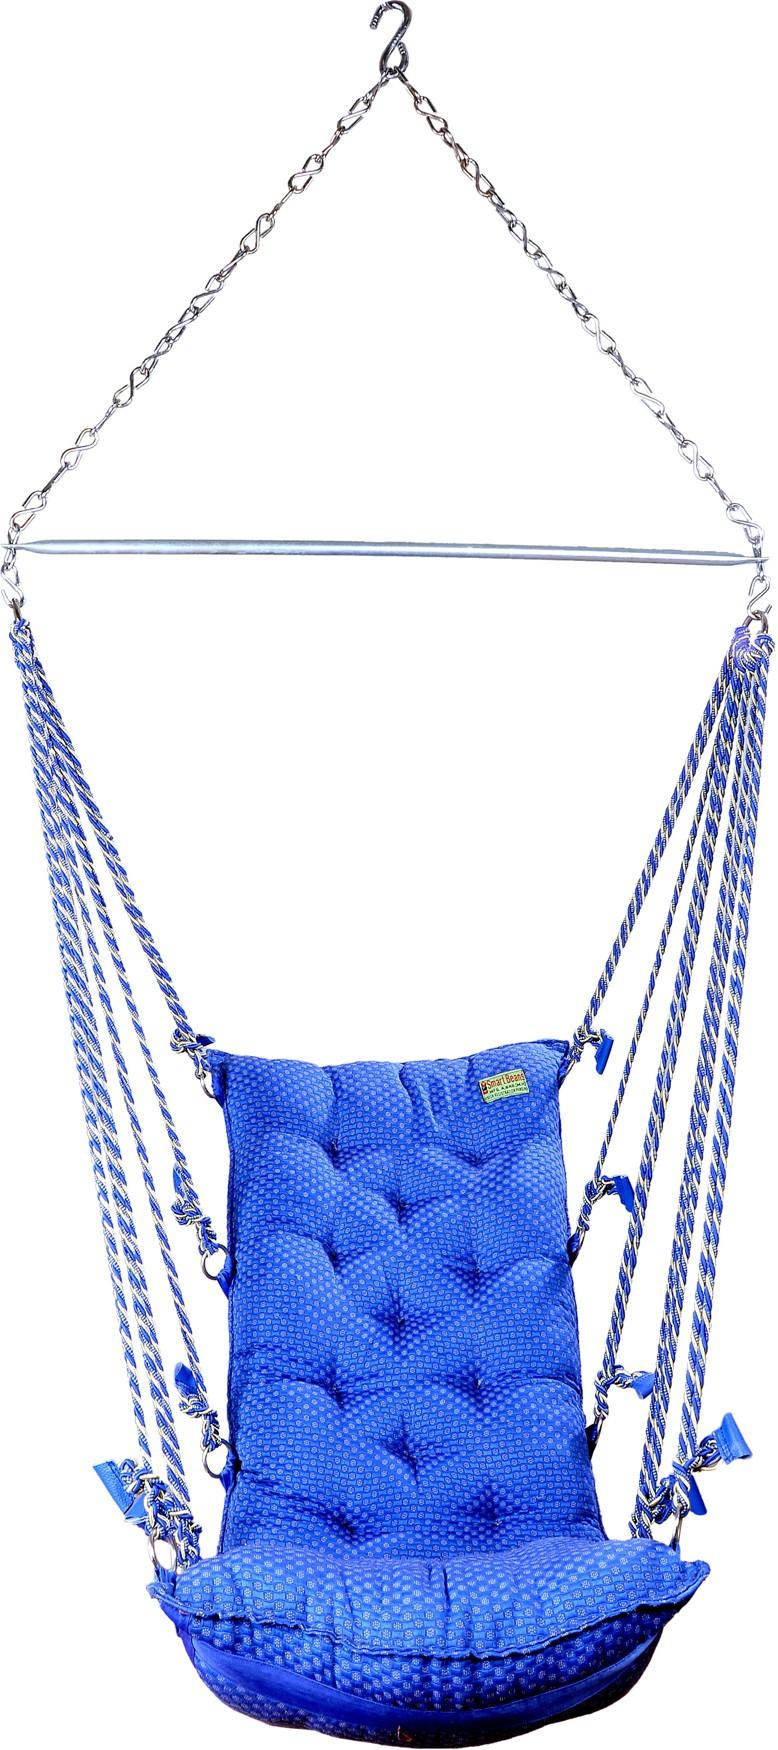 View Smart Beans Smart Beans Swing Hammock Blue Cotton Hammock(Blue) Furniture (Smart Beans)